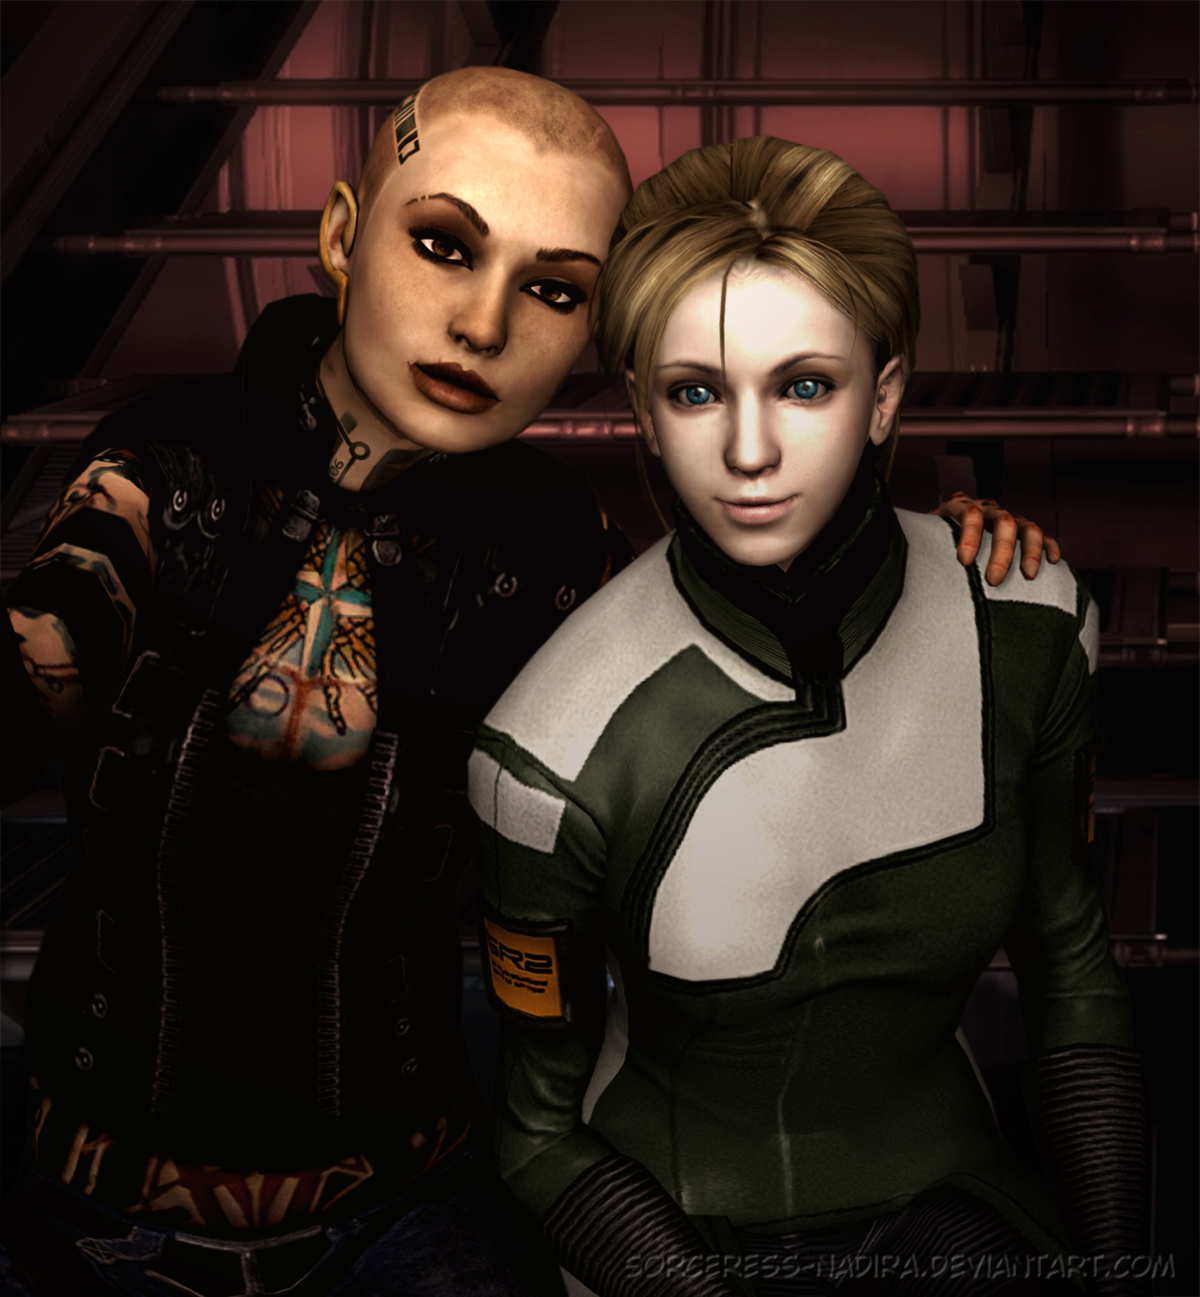 Biotic sisters by Sorceress-Nadira